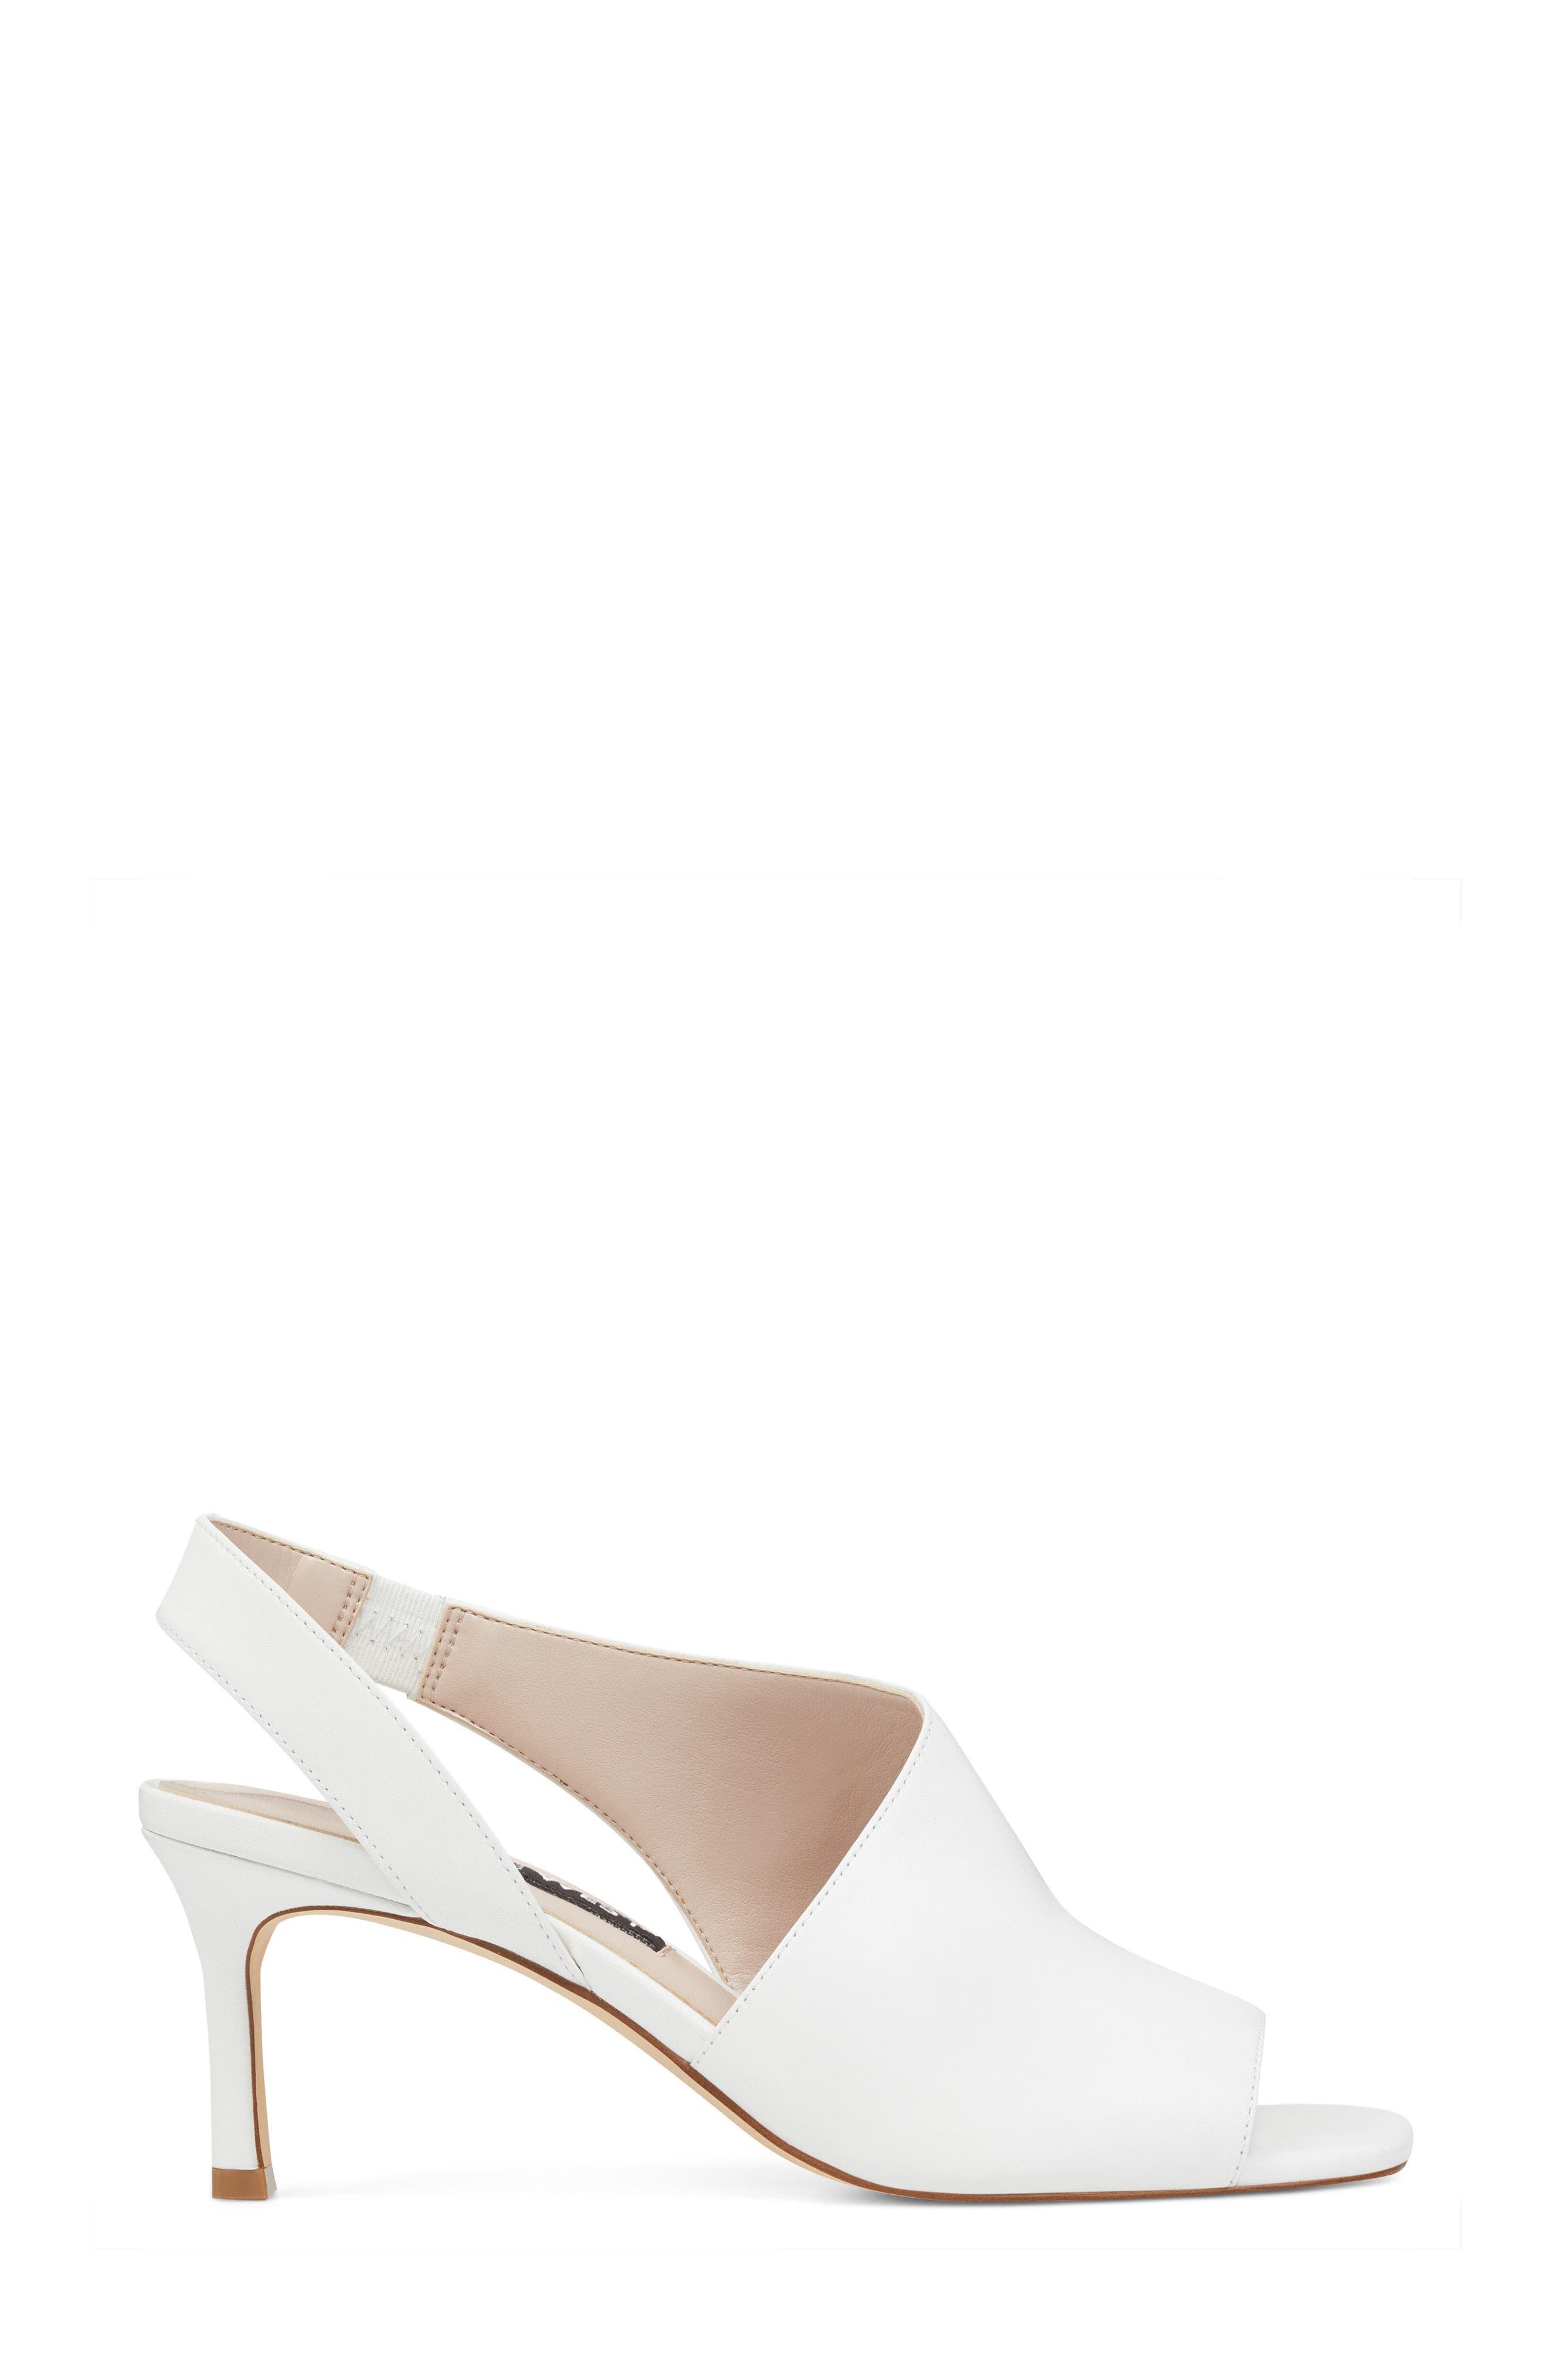 Orrus Asymmetrical Sandal,                             Alternate thumbnail 3, color,                             White Leather